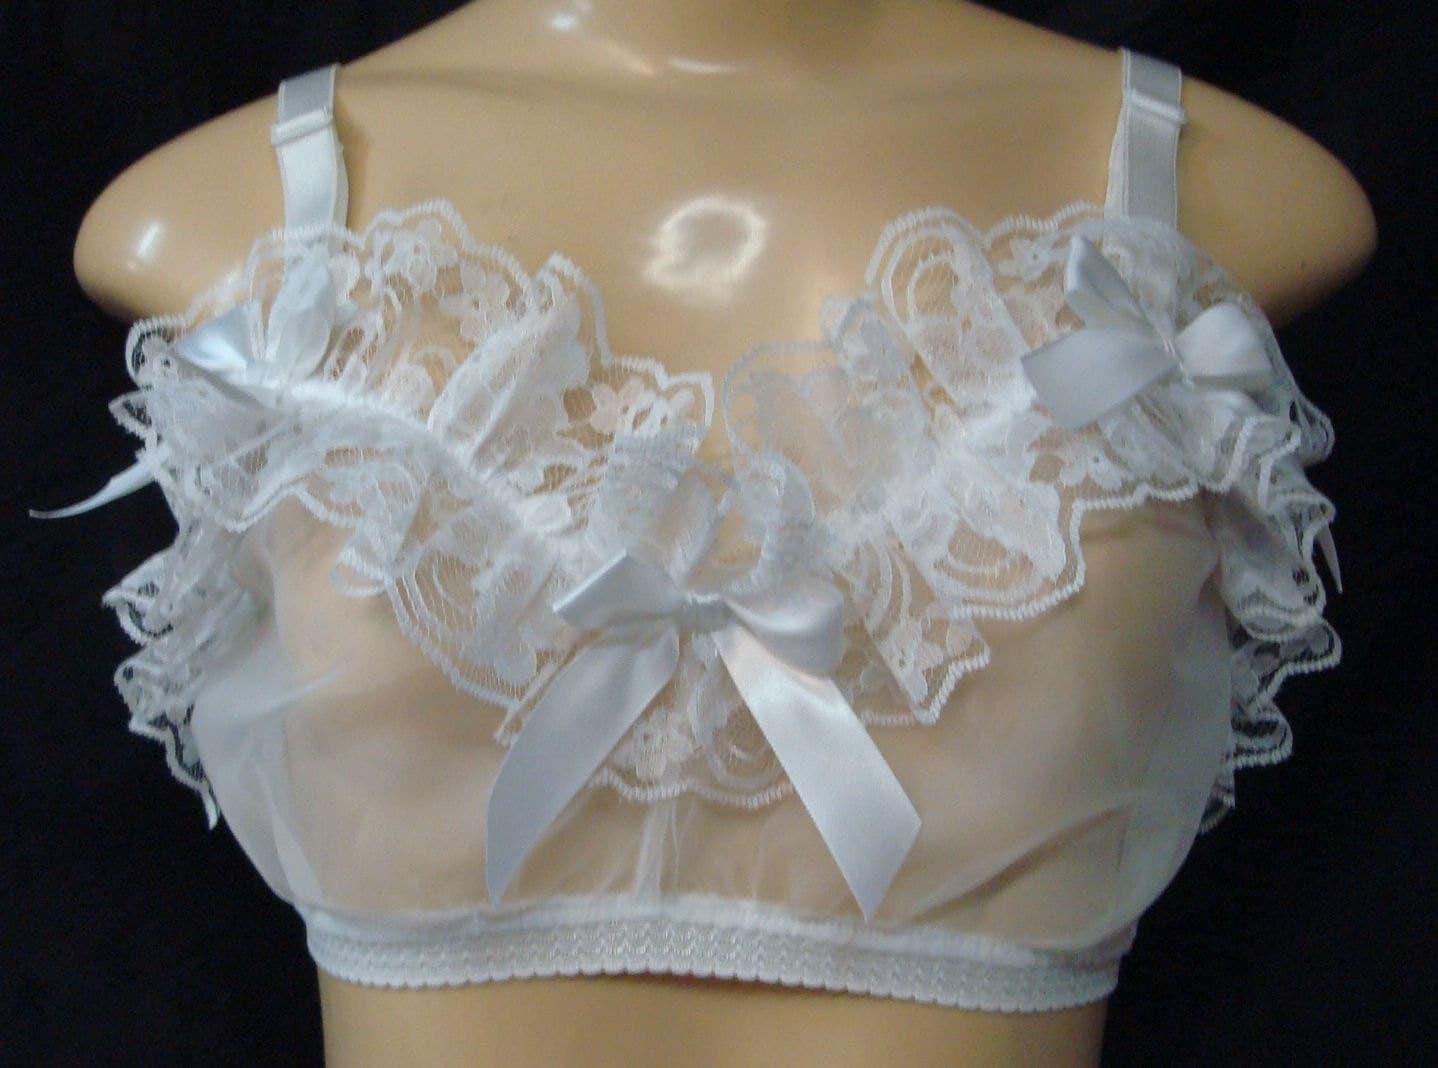 5170a34414 Adult Sissy White Sheer Chiffon Pantie and training Bra Set cross dresser  cosplay